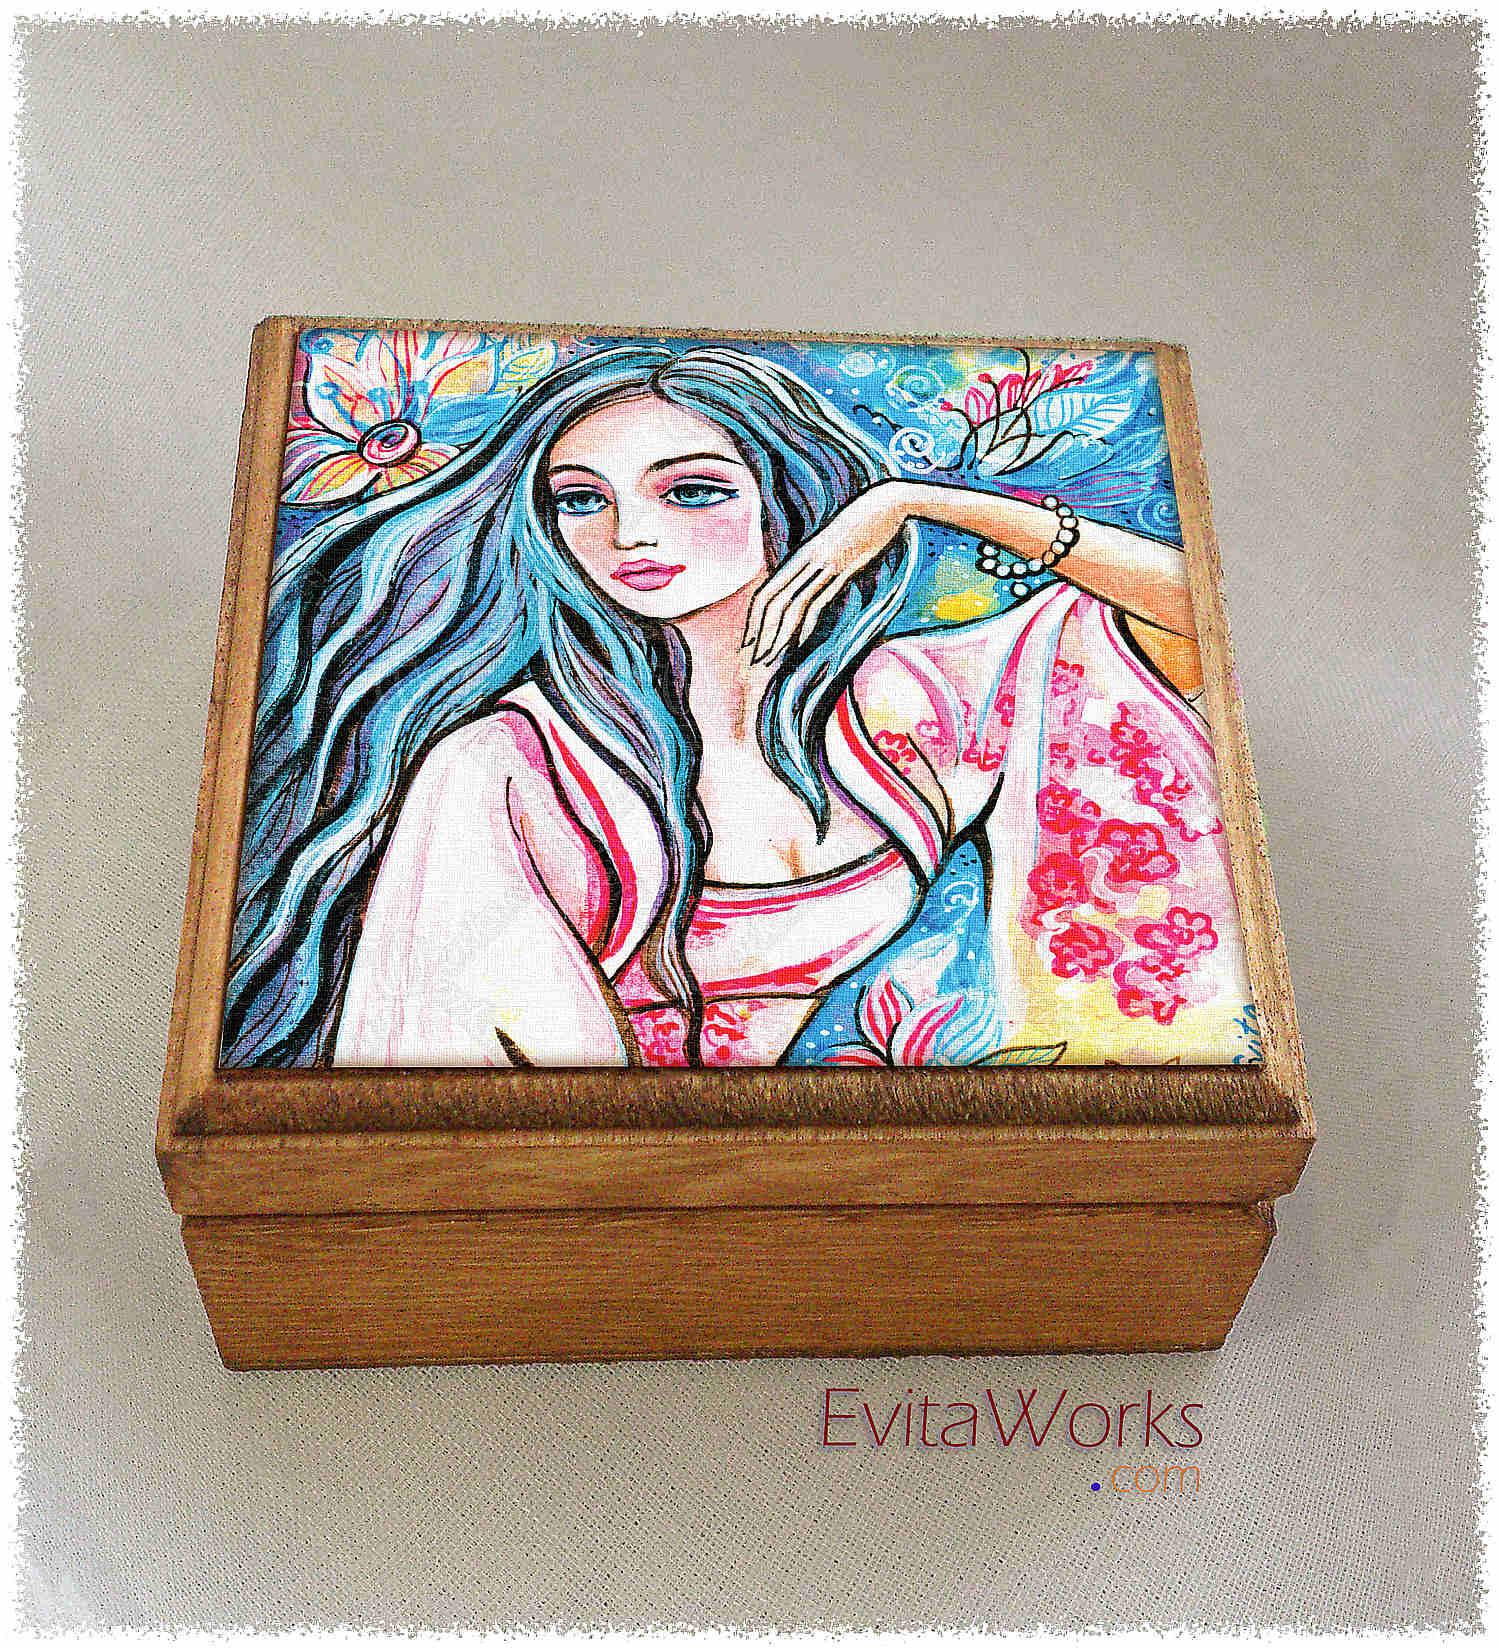 East Woman 08 Boxsq ~ EvitaWorks